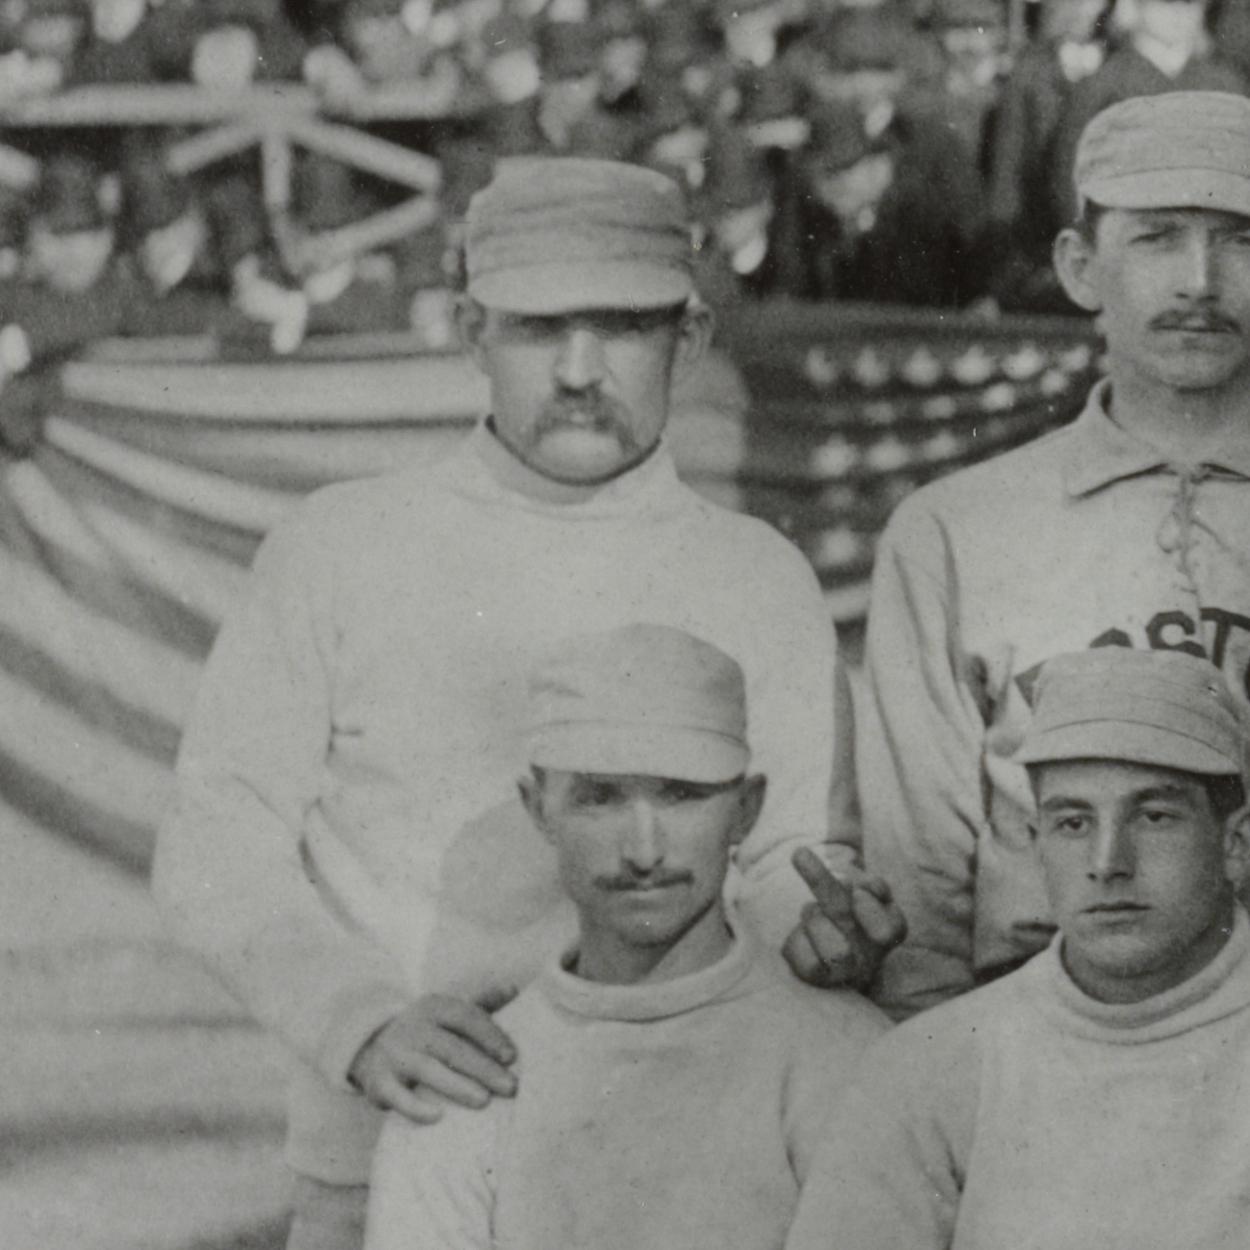 History Of The Boston Braves